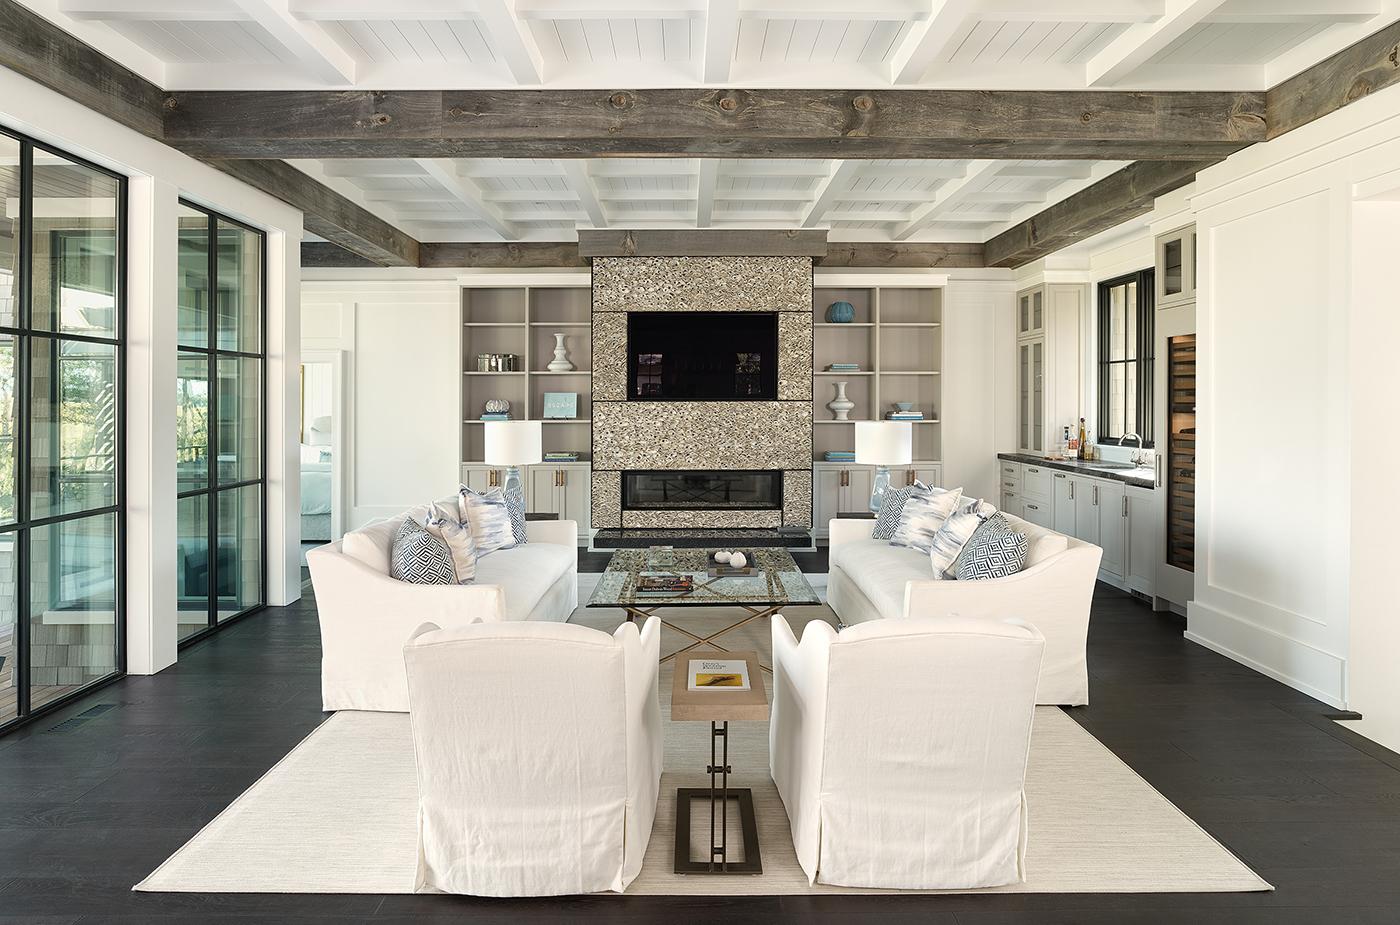 The Relationship Between Interior Design & Architectural Design